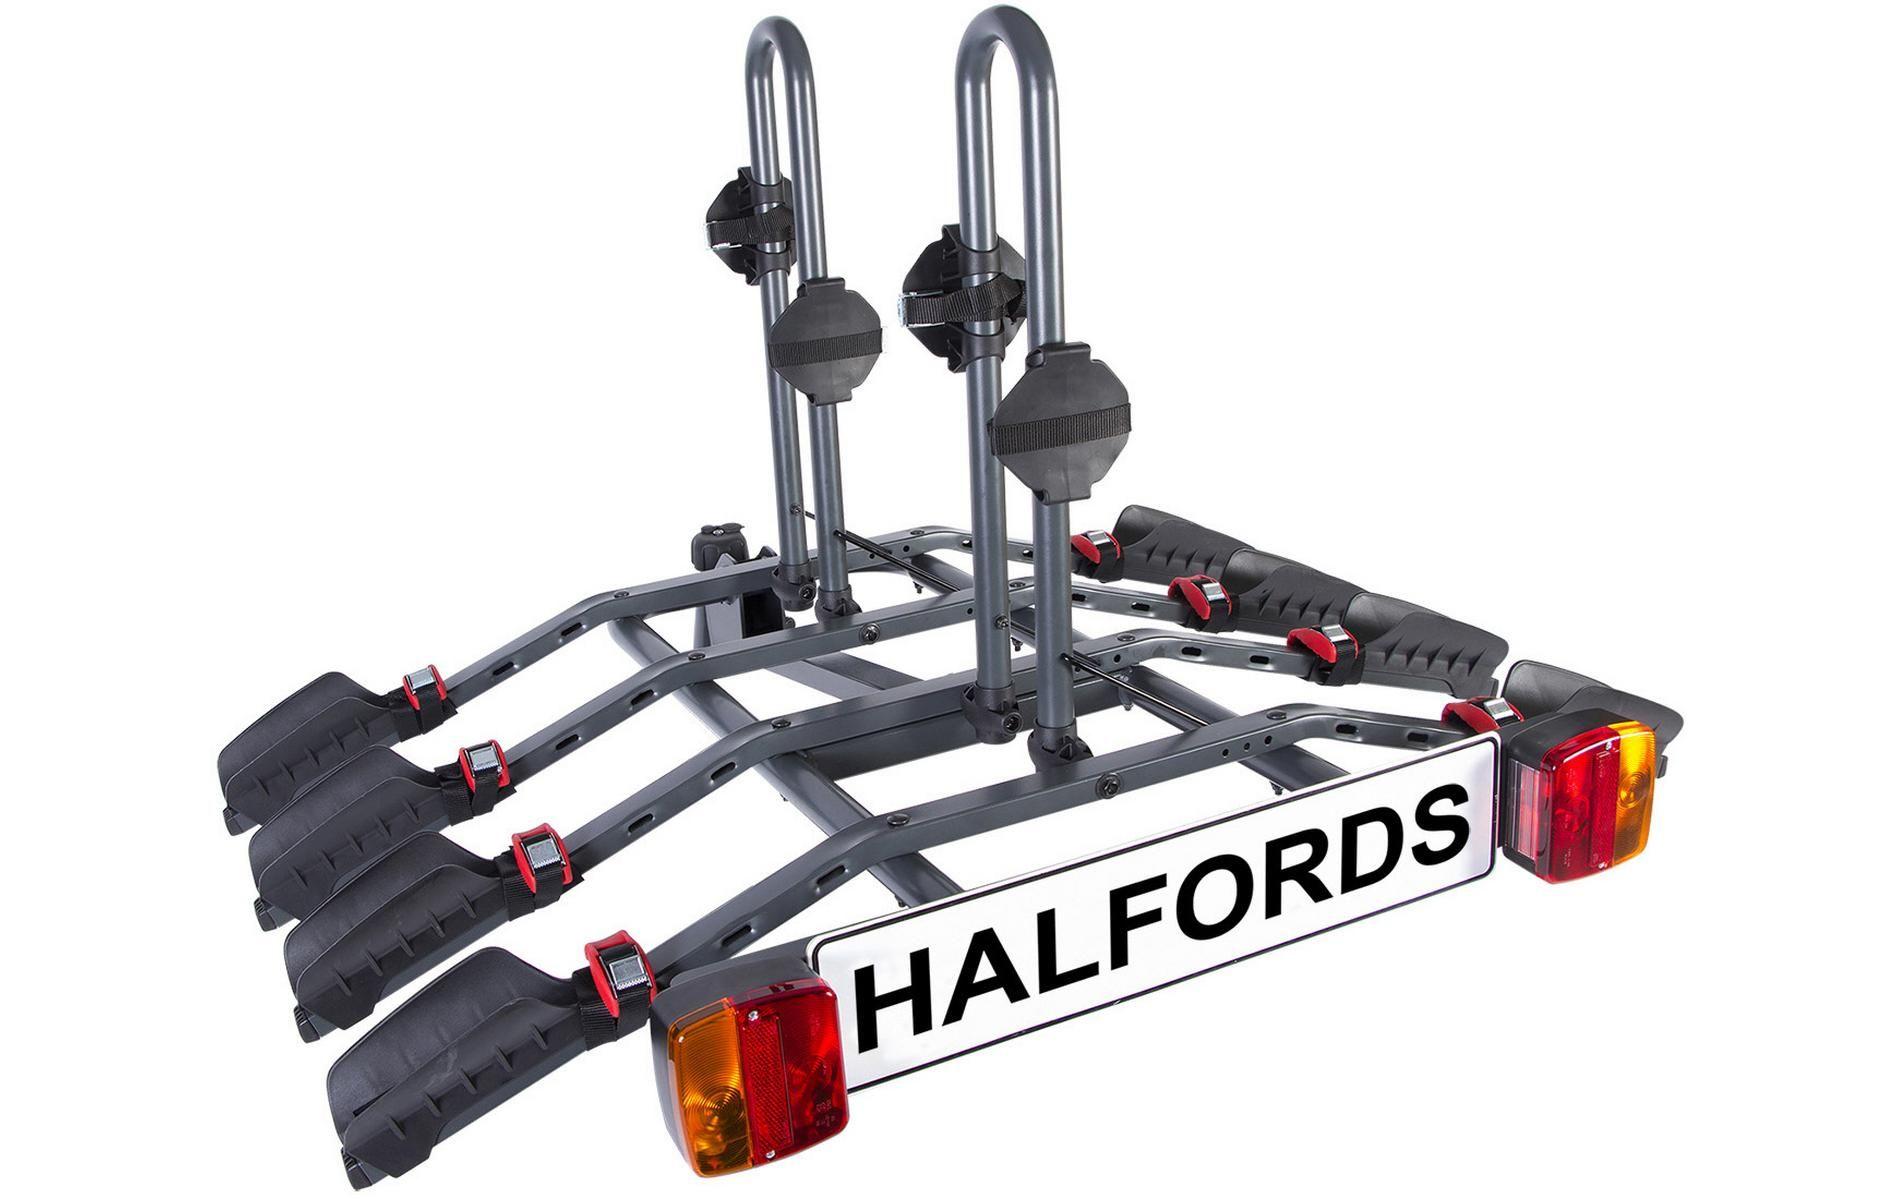 Halfords 4 Bike Tow Bar Cycle Carrier Bike rack, Cycle